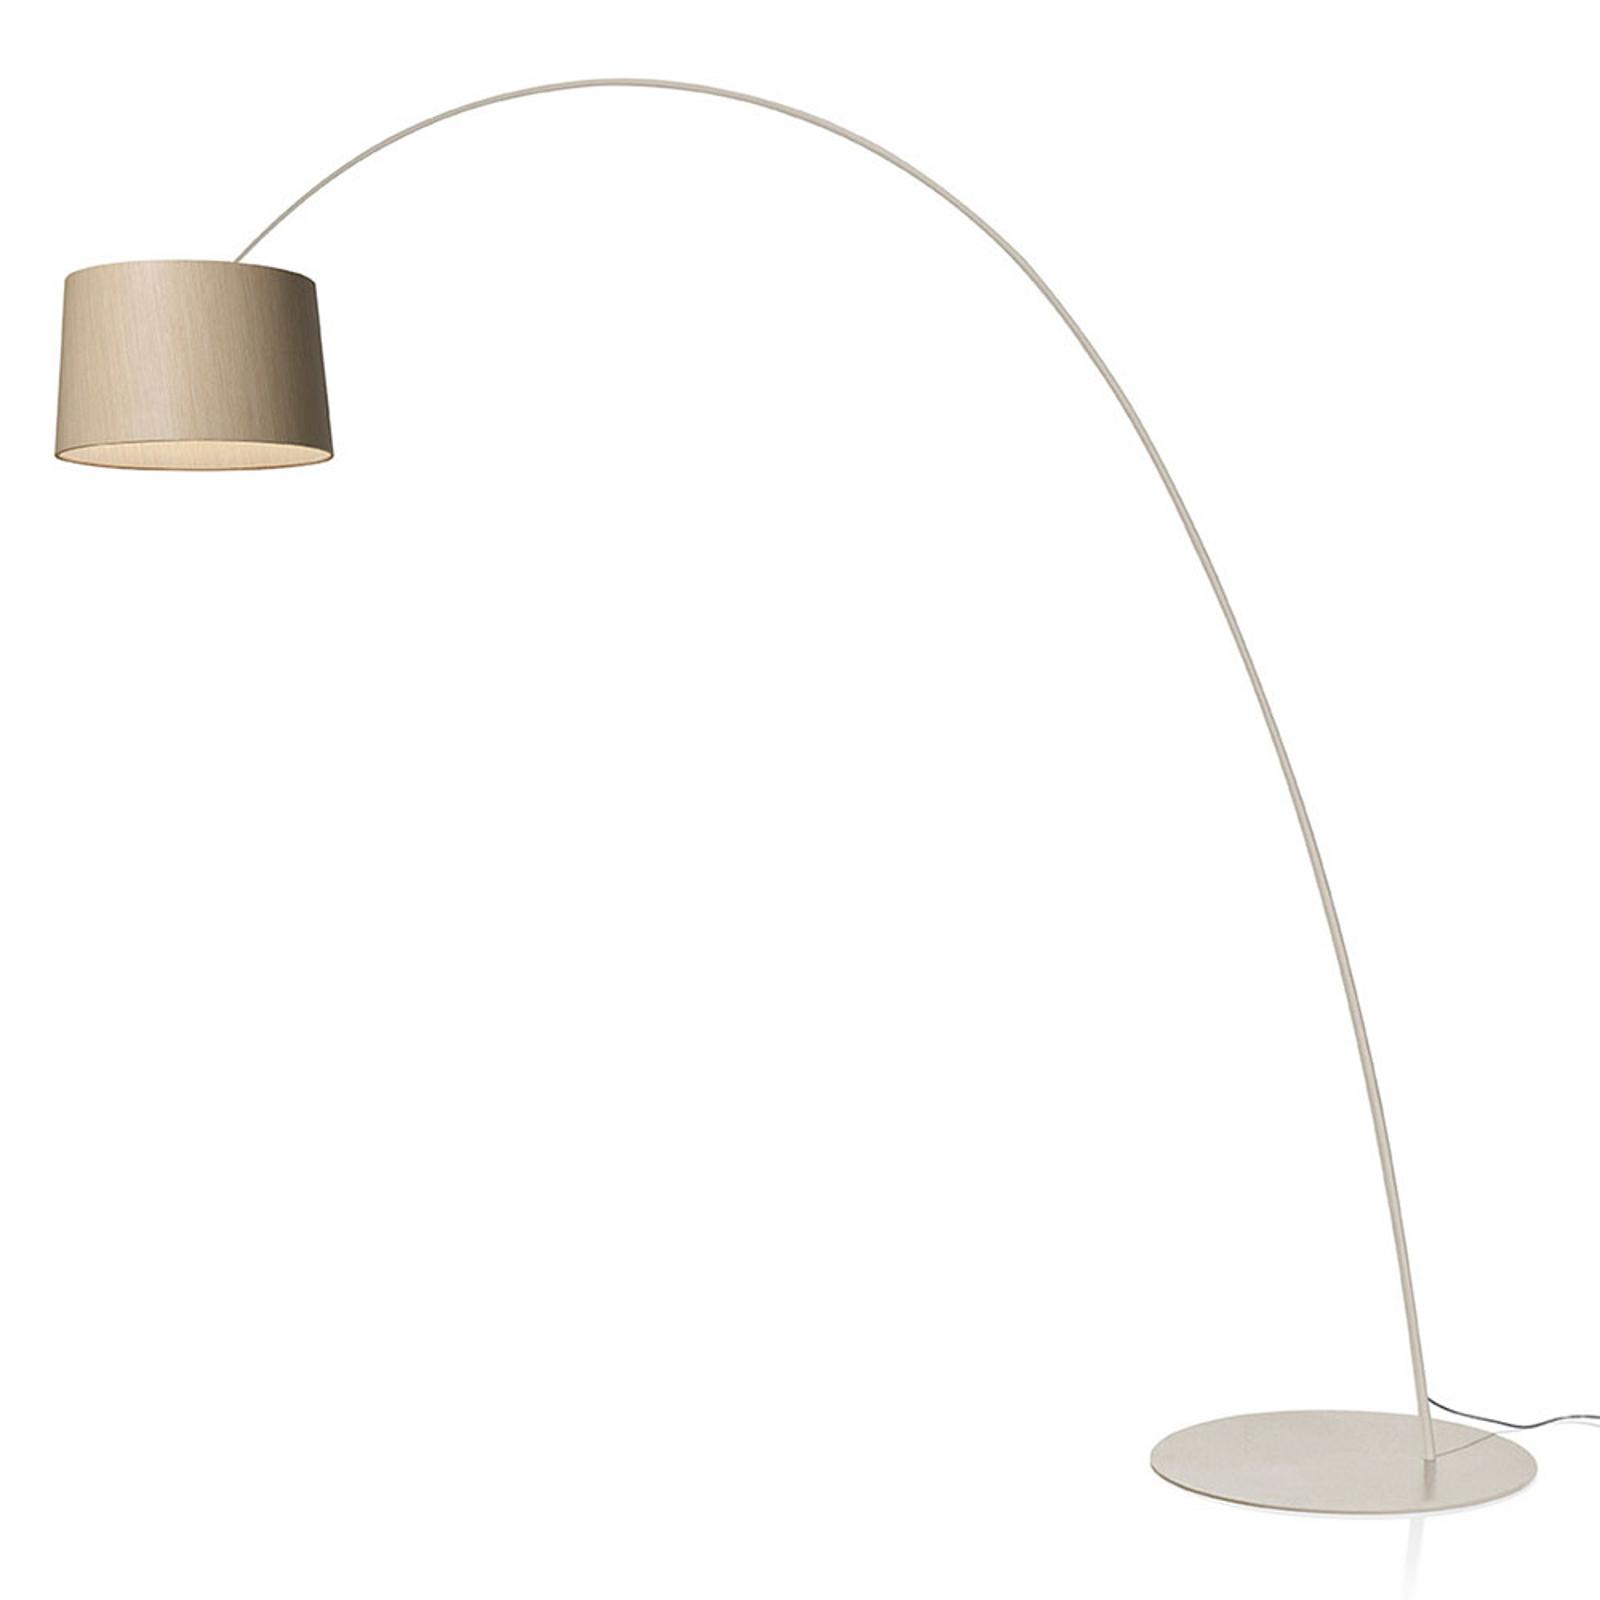 Foscarini Twiggy Wood MyLight Stehlampe CCT greige